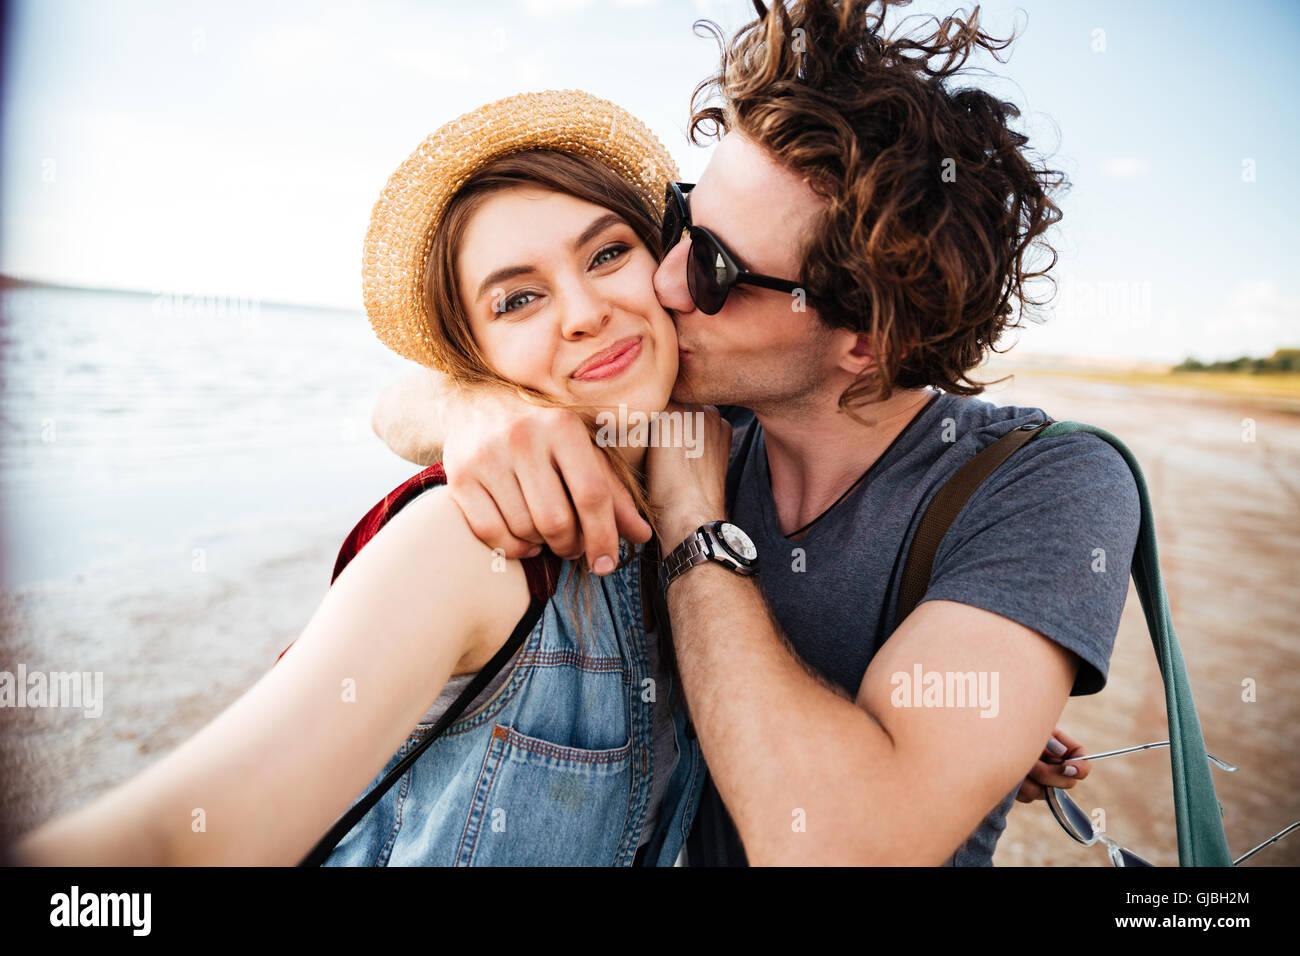 Joven pareja besándose y teniendo selfie afuera Imagen De Stock